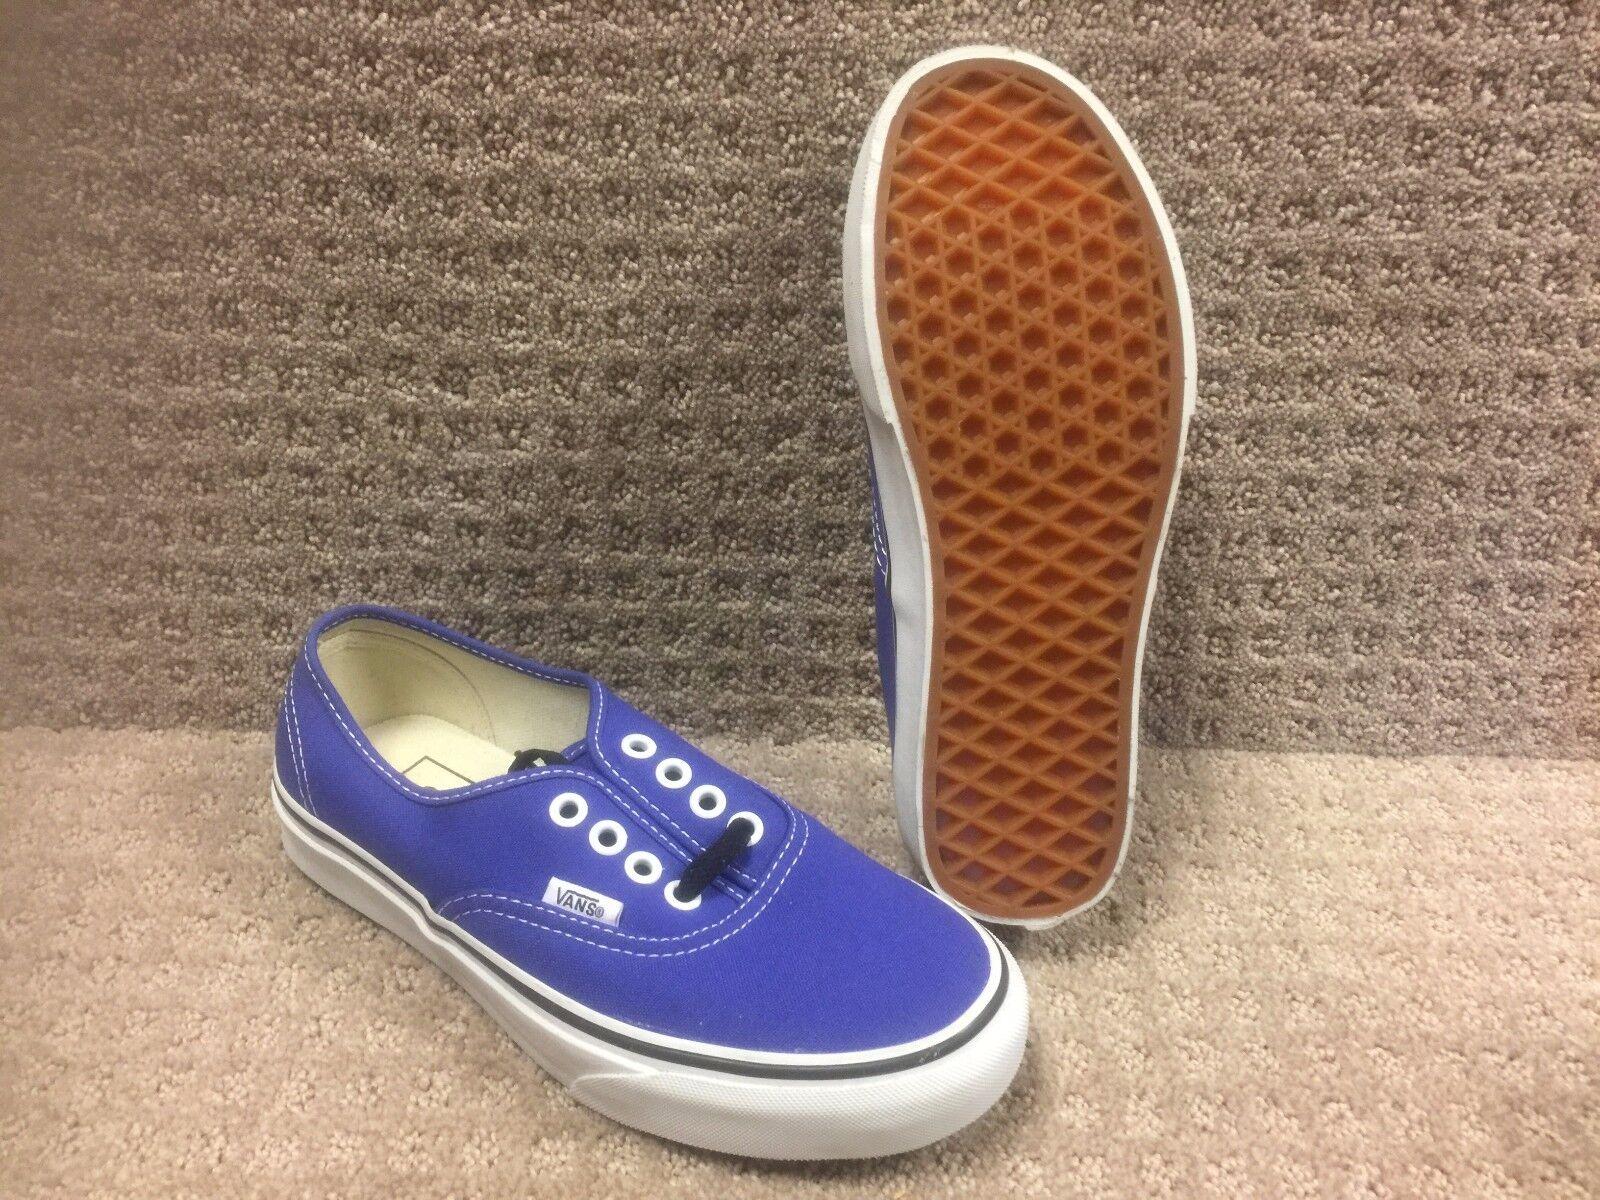 Furgoni scarpe bianco da uomo